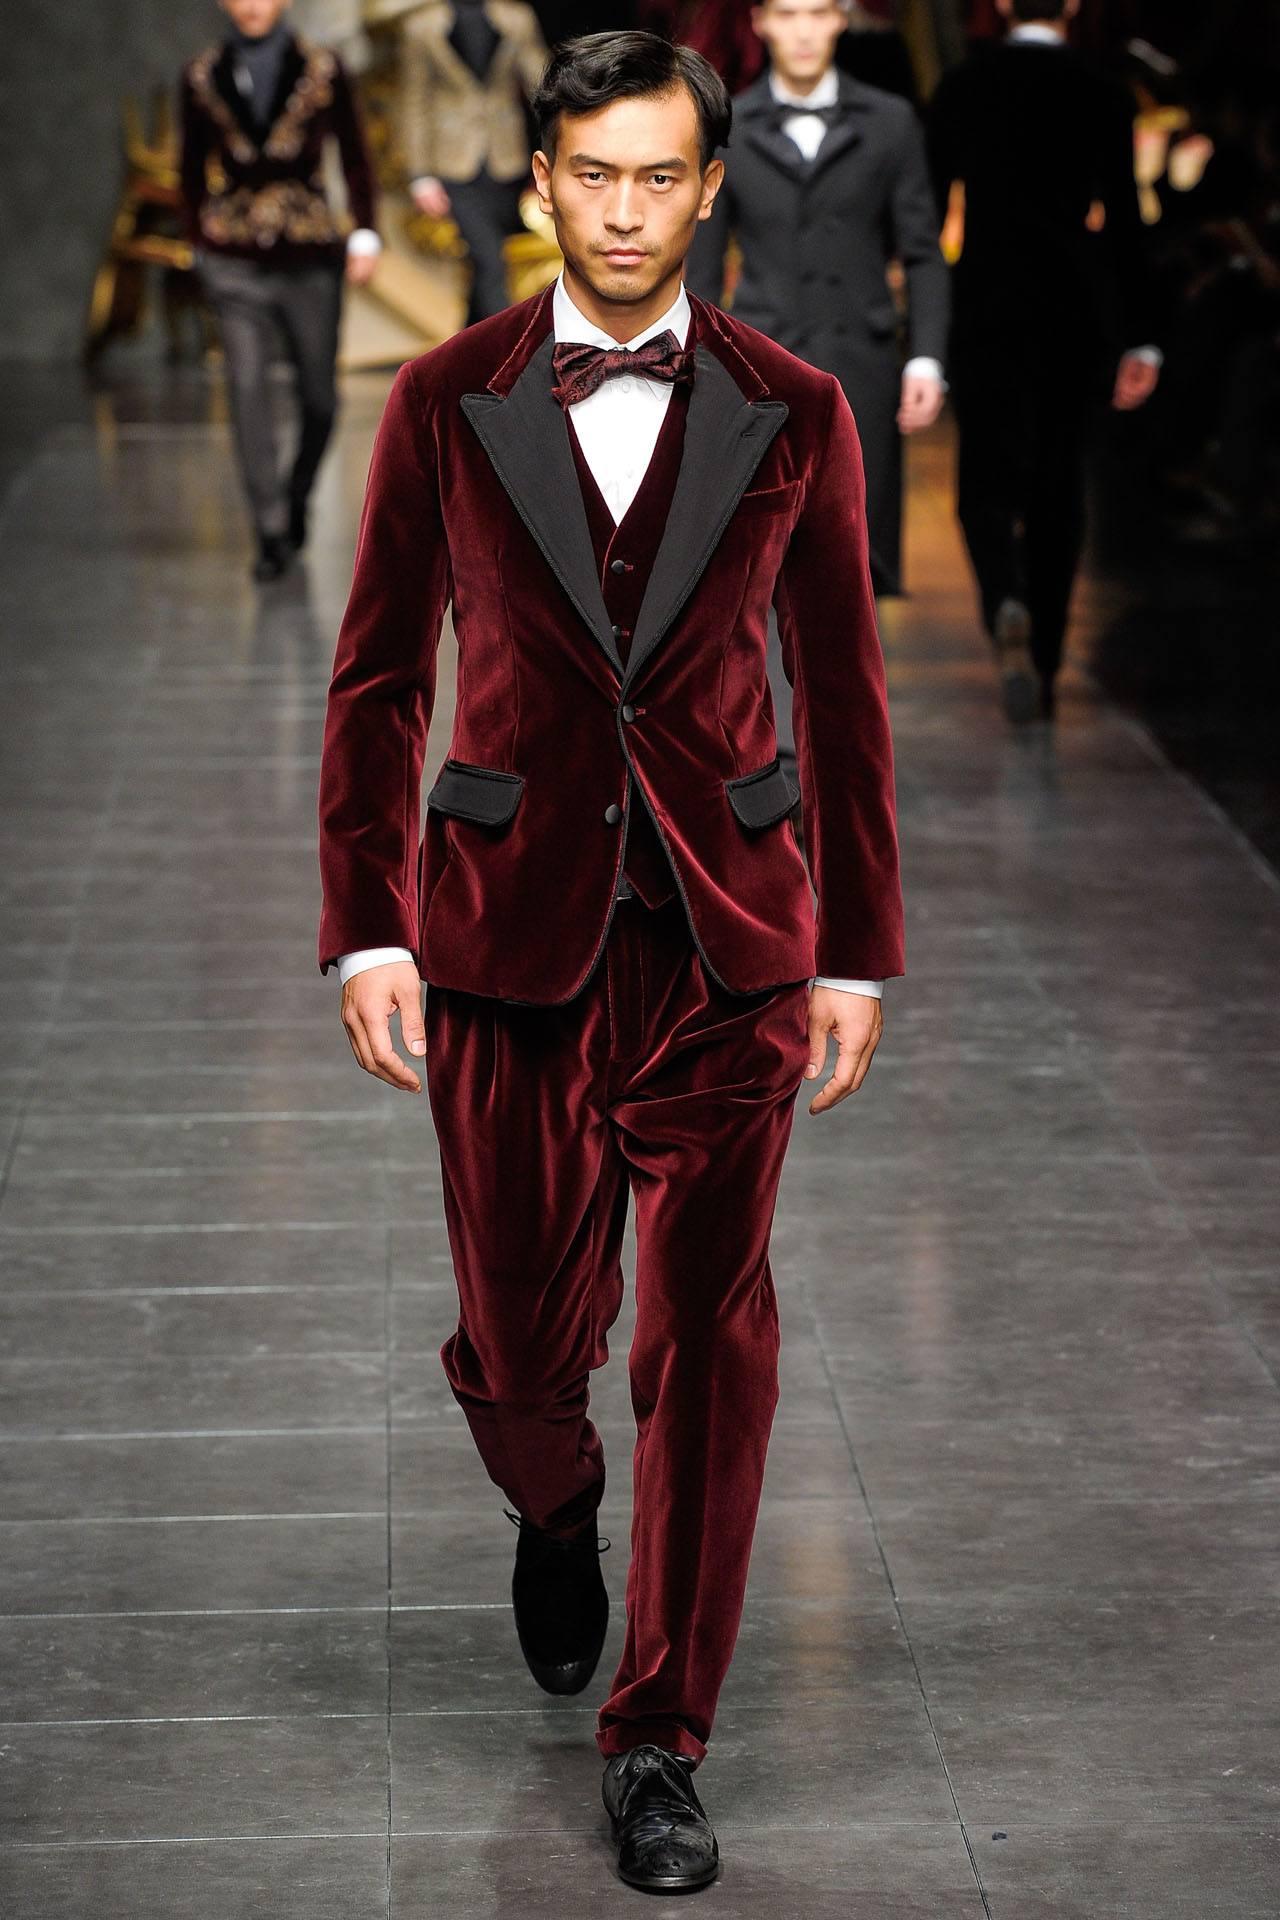 Tuxedo fashion trends 2018 36